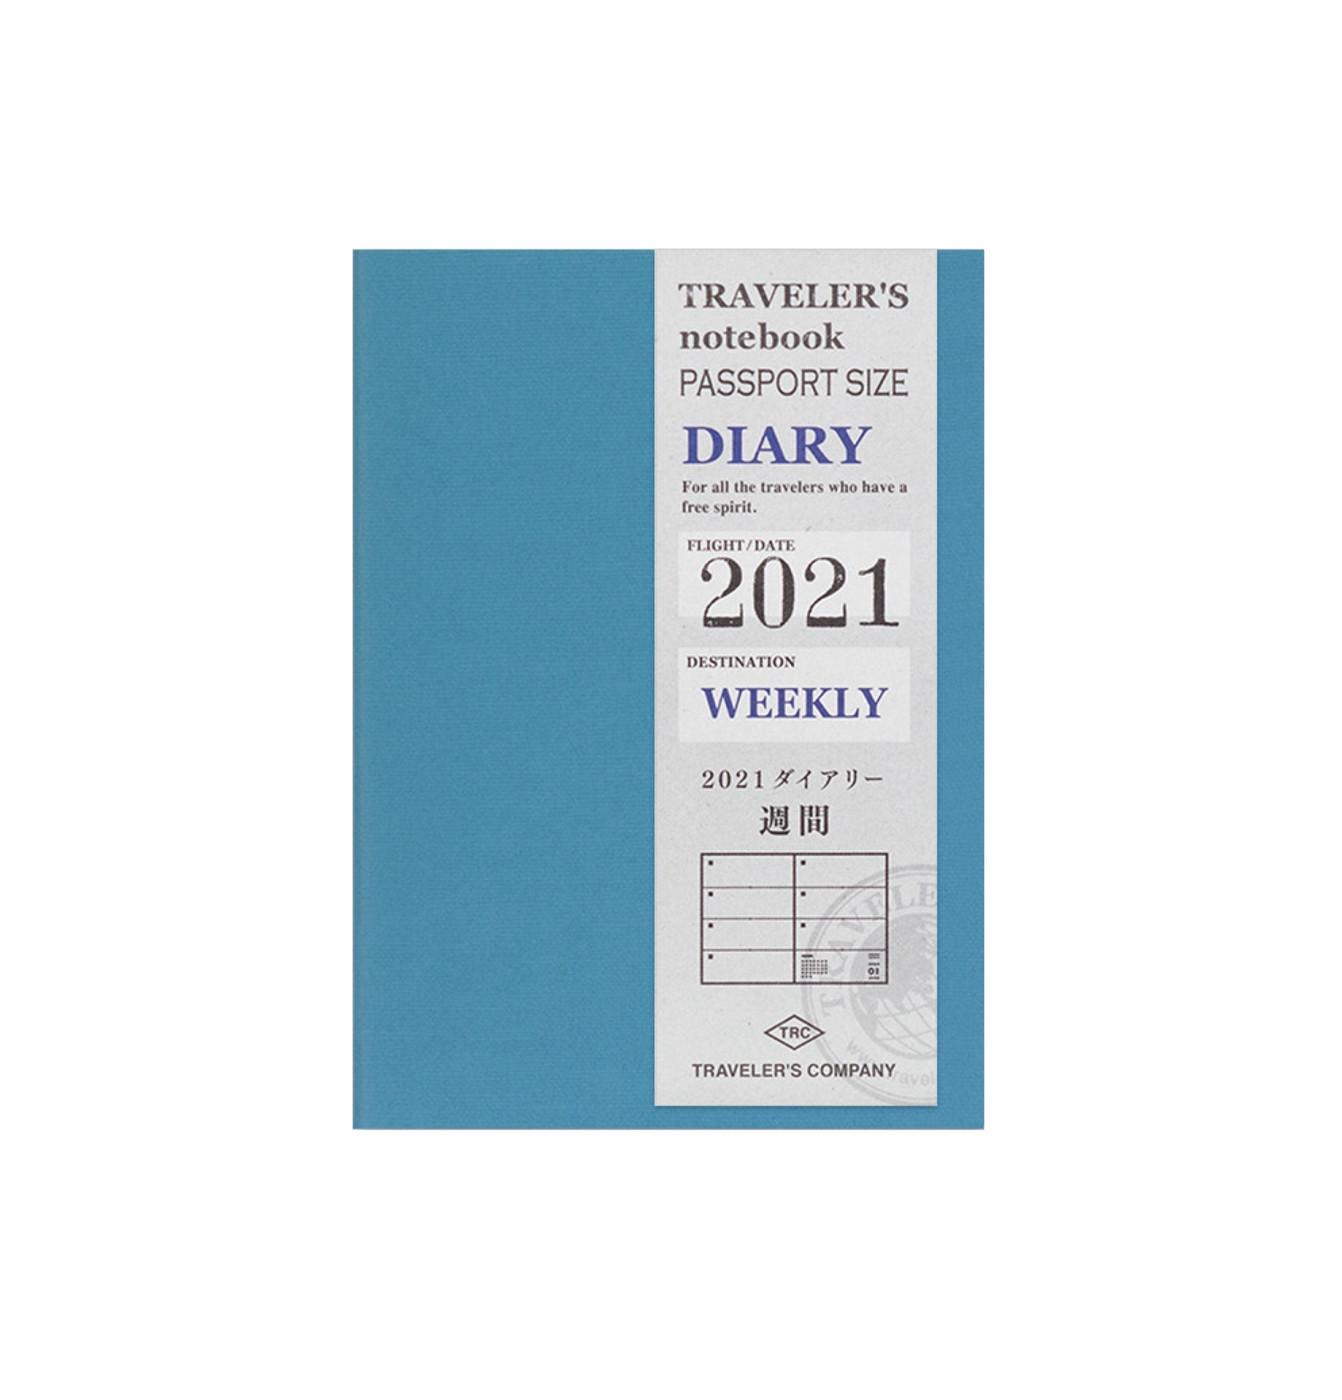 TRAVELER'S notebook 2021 weekly diary - passport size